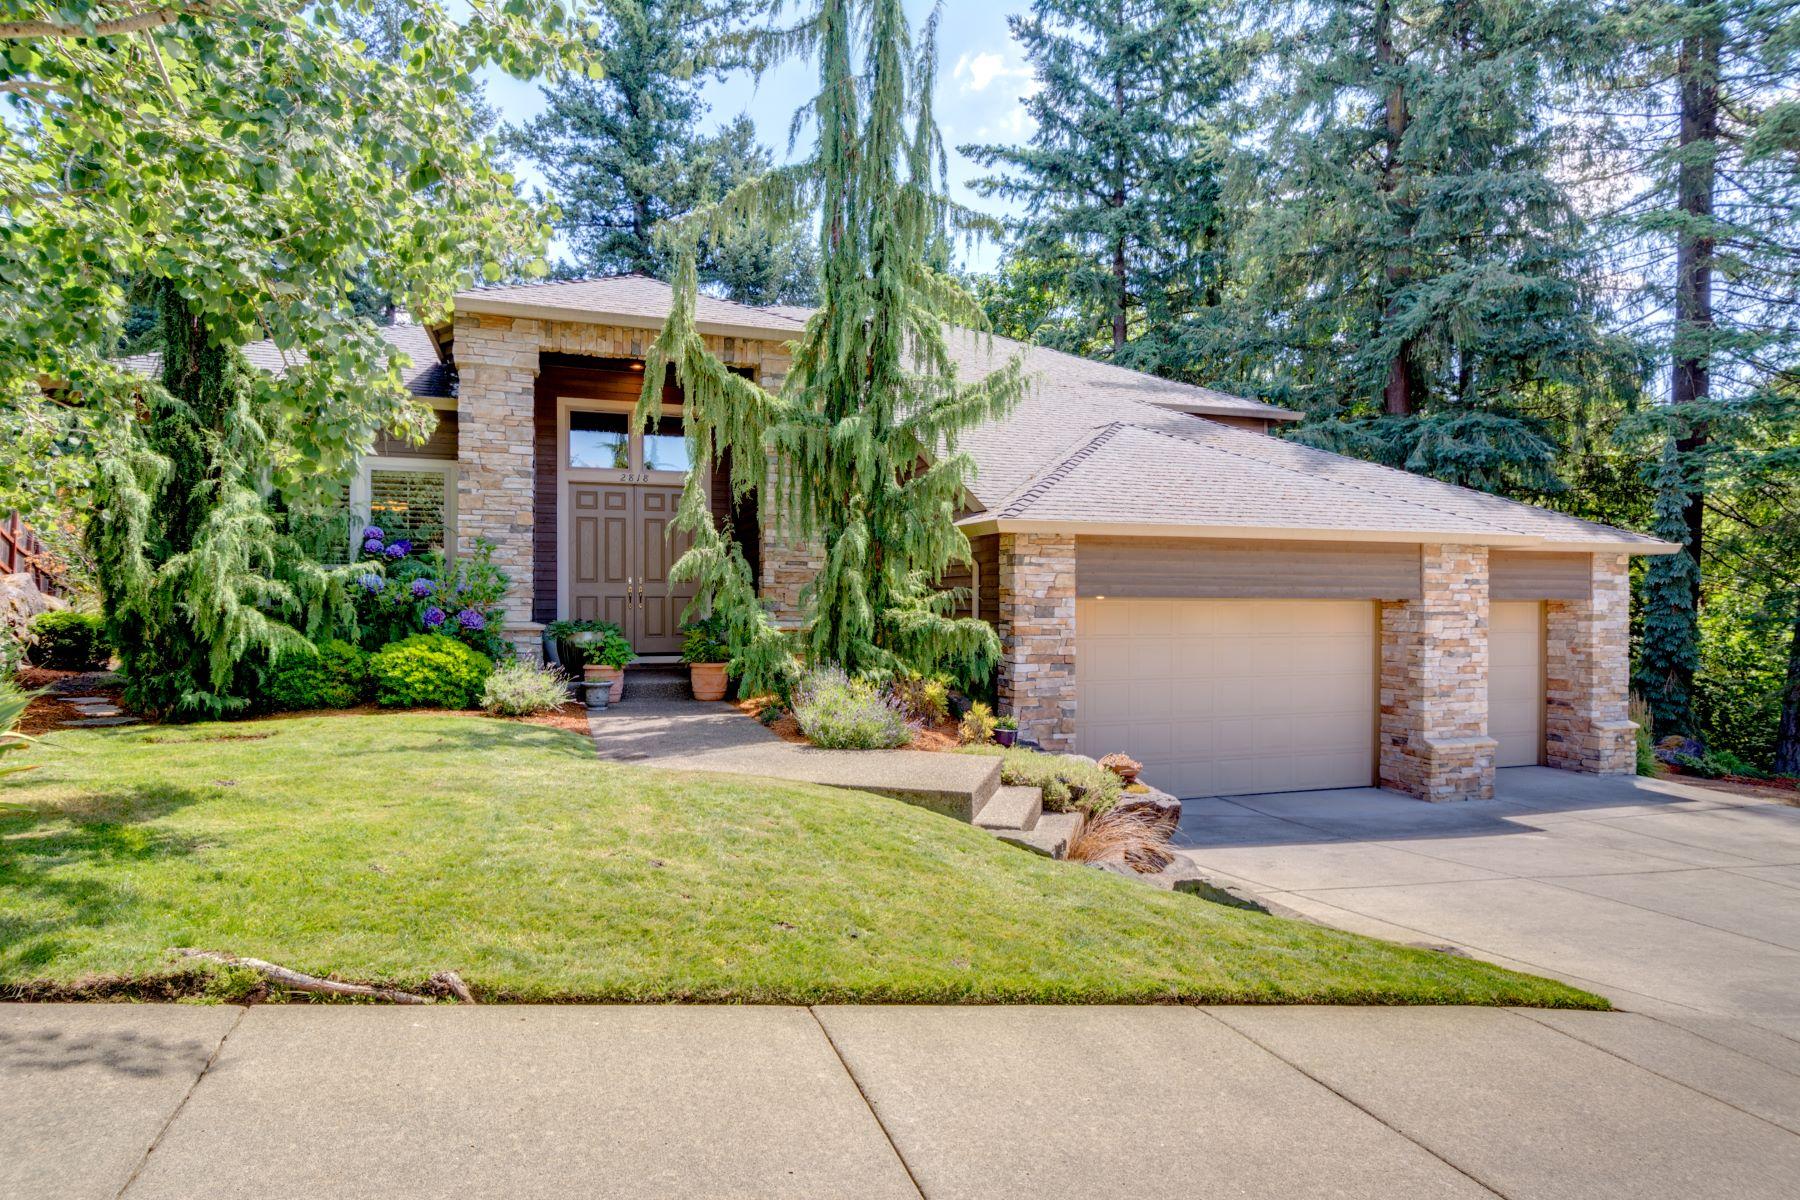 獨棟家庭住宅 為 出售 在 Superior Quality in Holly Hills 2818 NW DAHLIA CT Camas, 華盛頓州 98607 美國